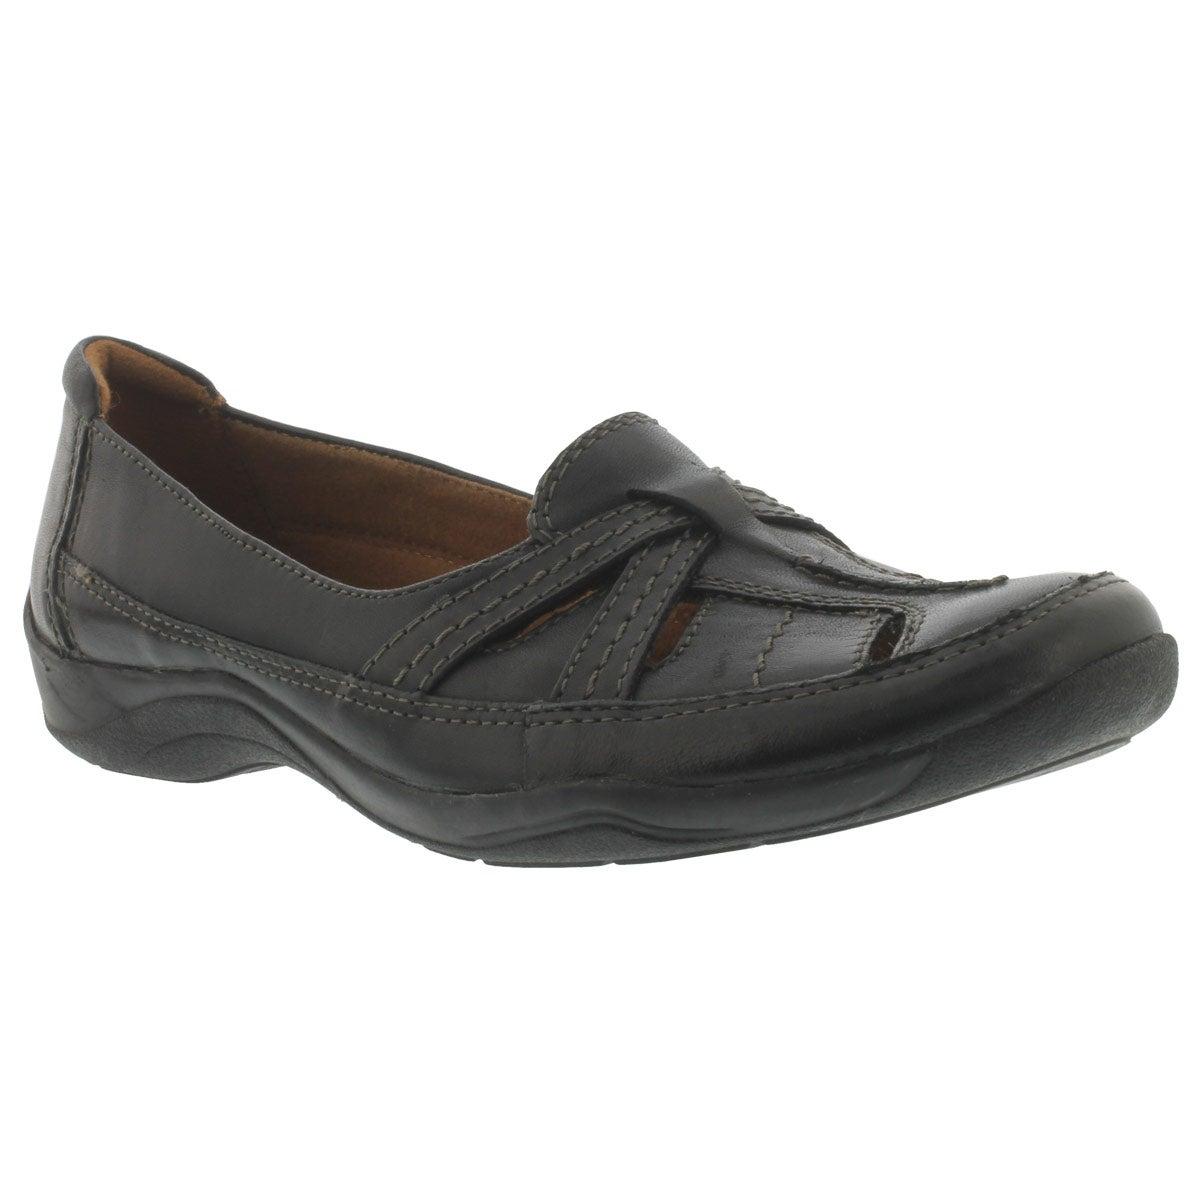 Chaussure Kessa Gifford, noir, fem